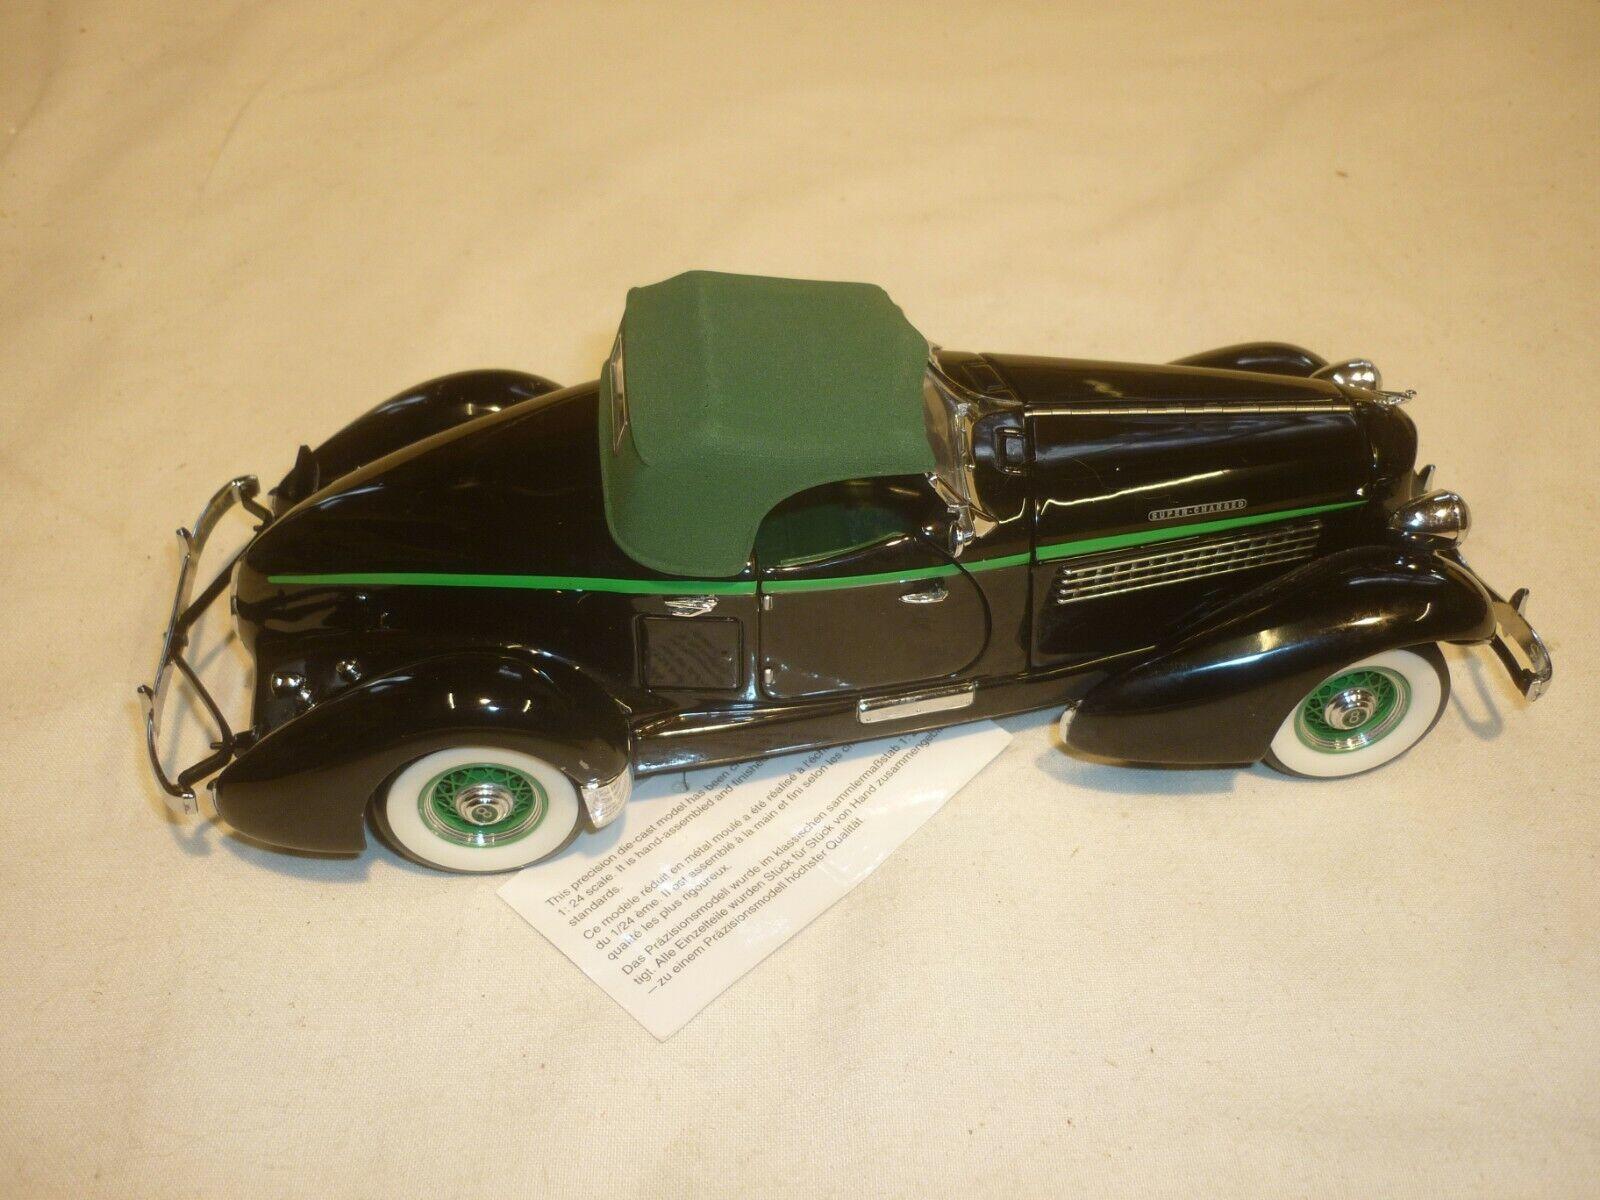 A Franklin mint scale model  of a 1935 Auburn 851 speedster boattail, no box  parfait